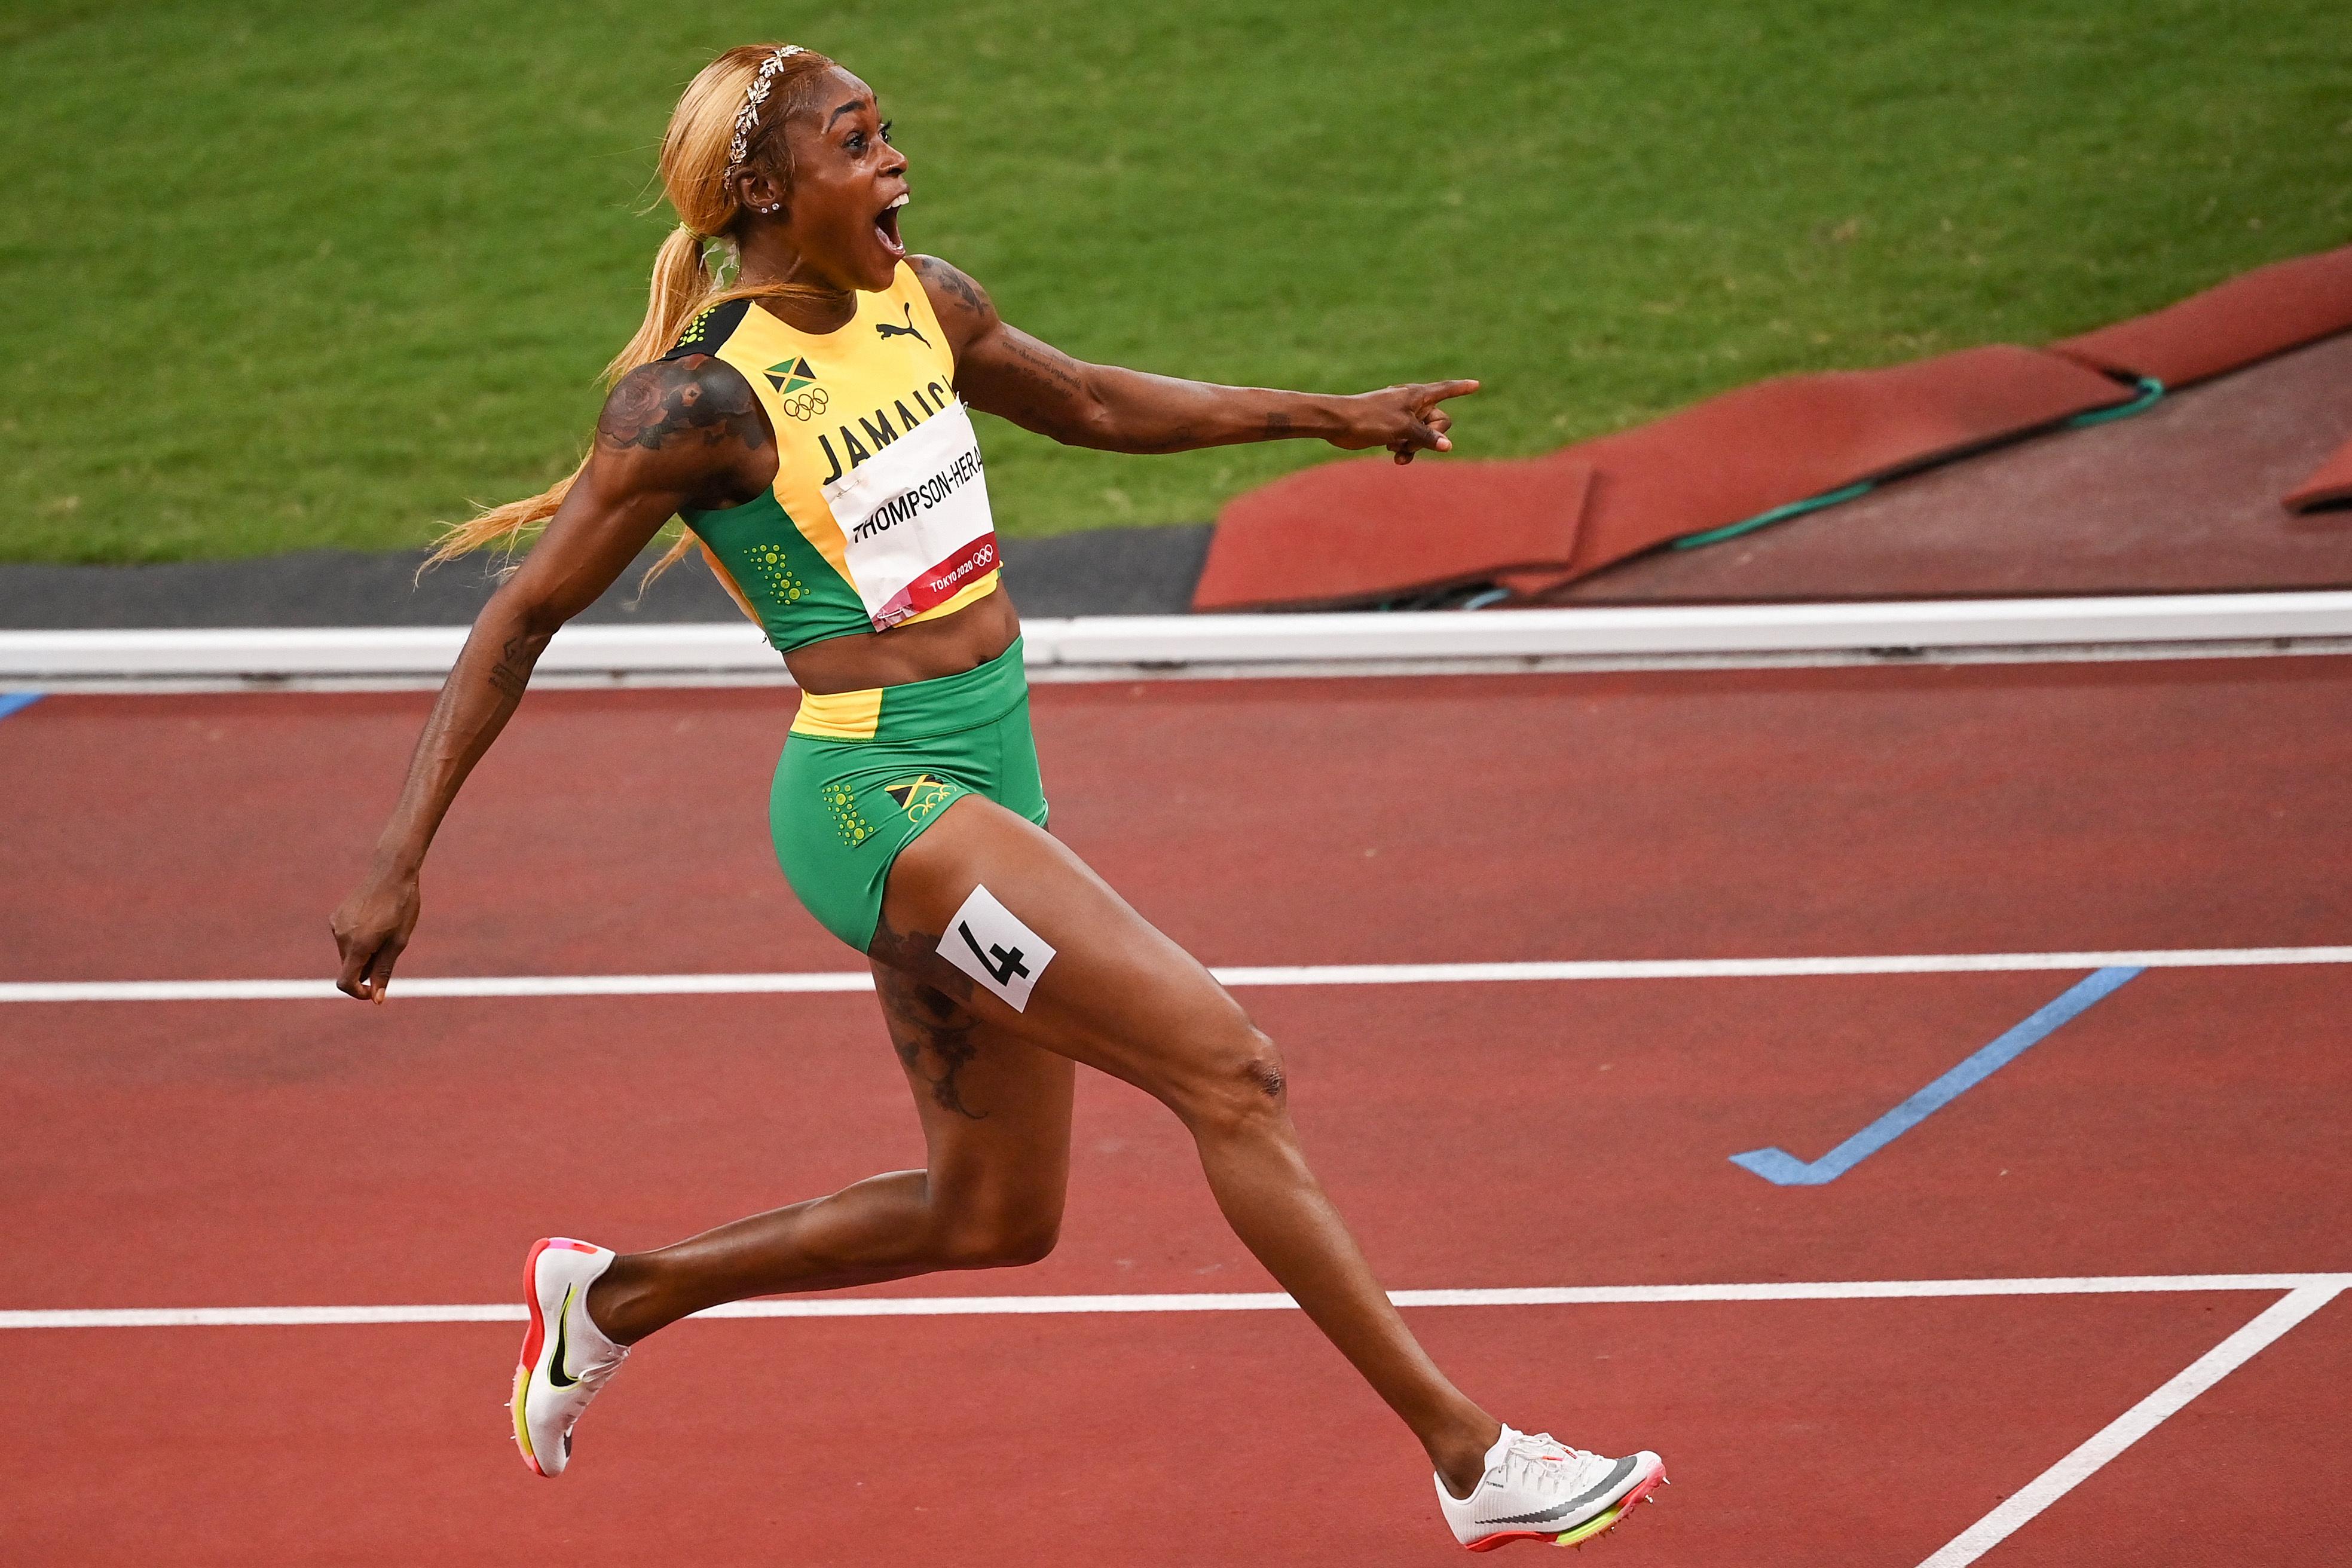 Watch Jamaica's Elaine Thompson-Herah Set Olympic Record in Women's 100m